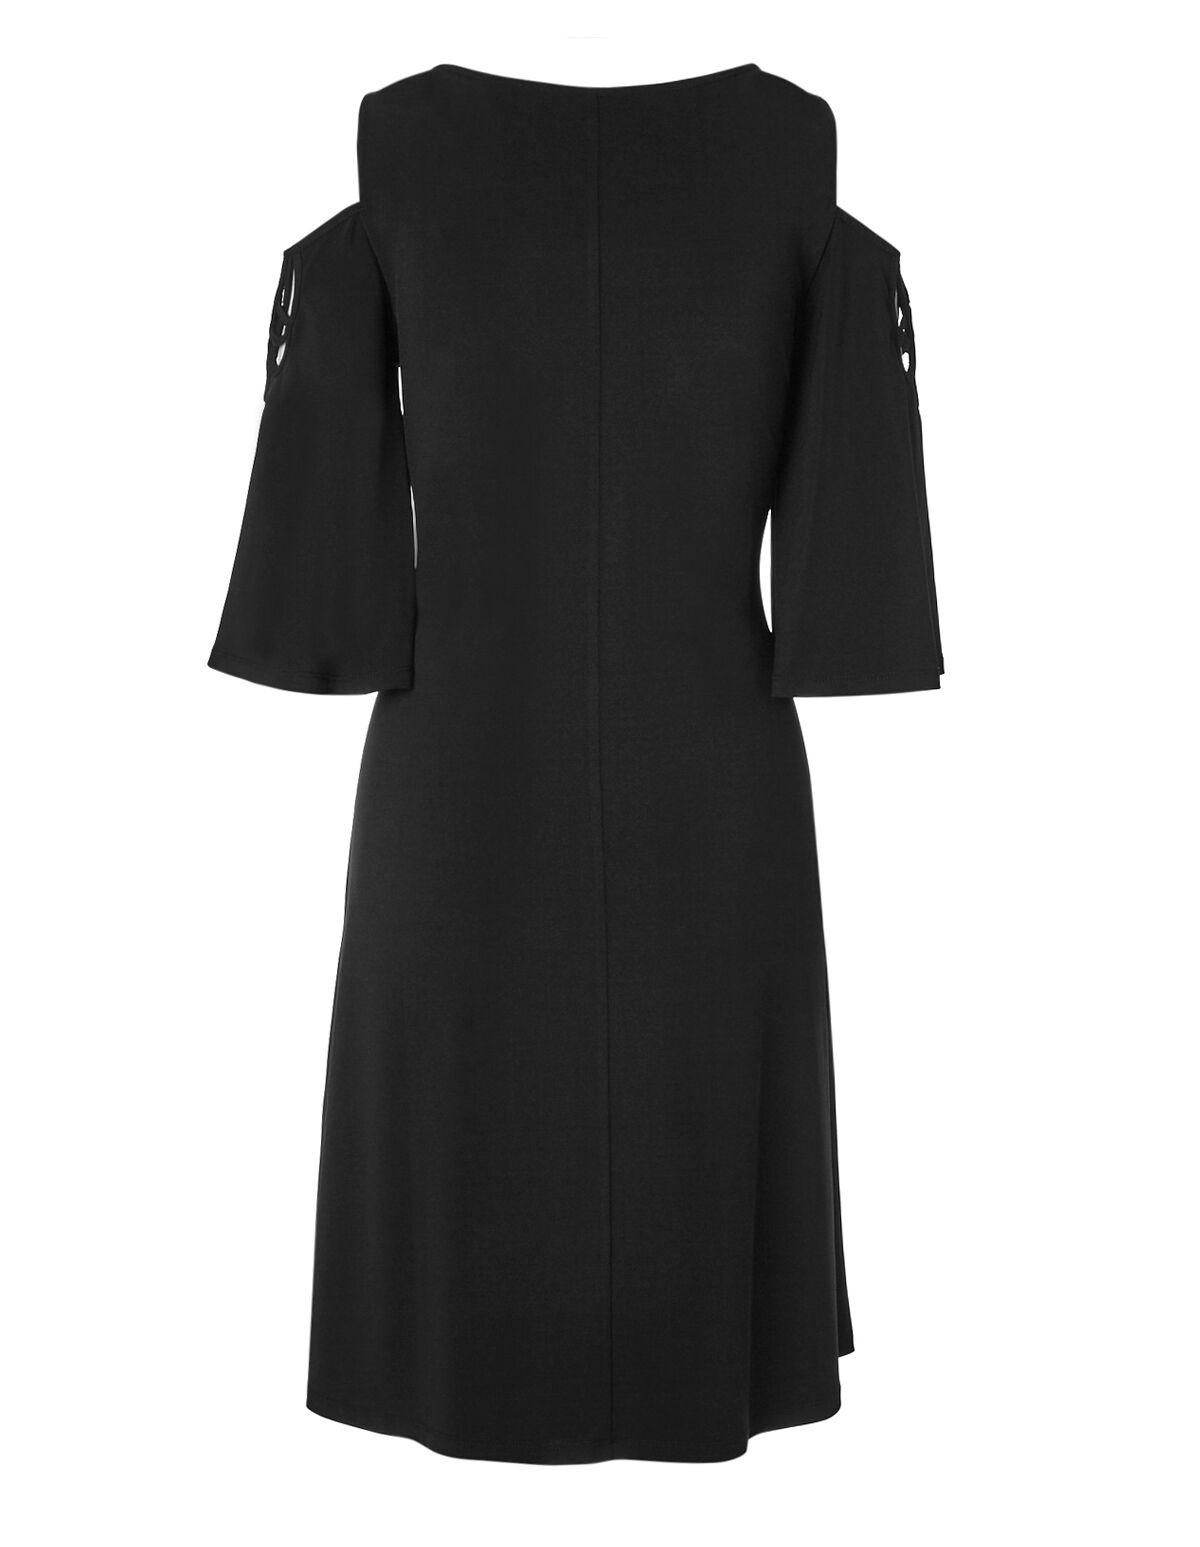 White city london stores dresses